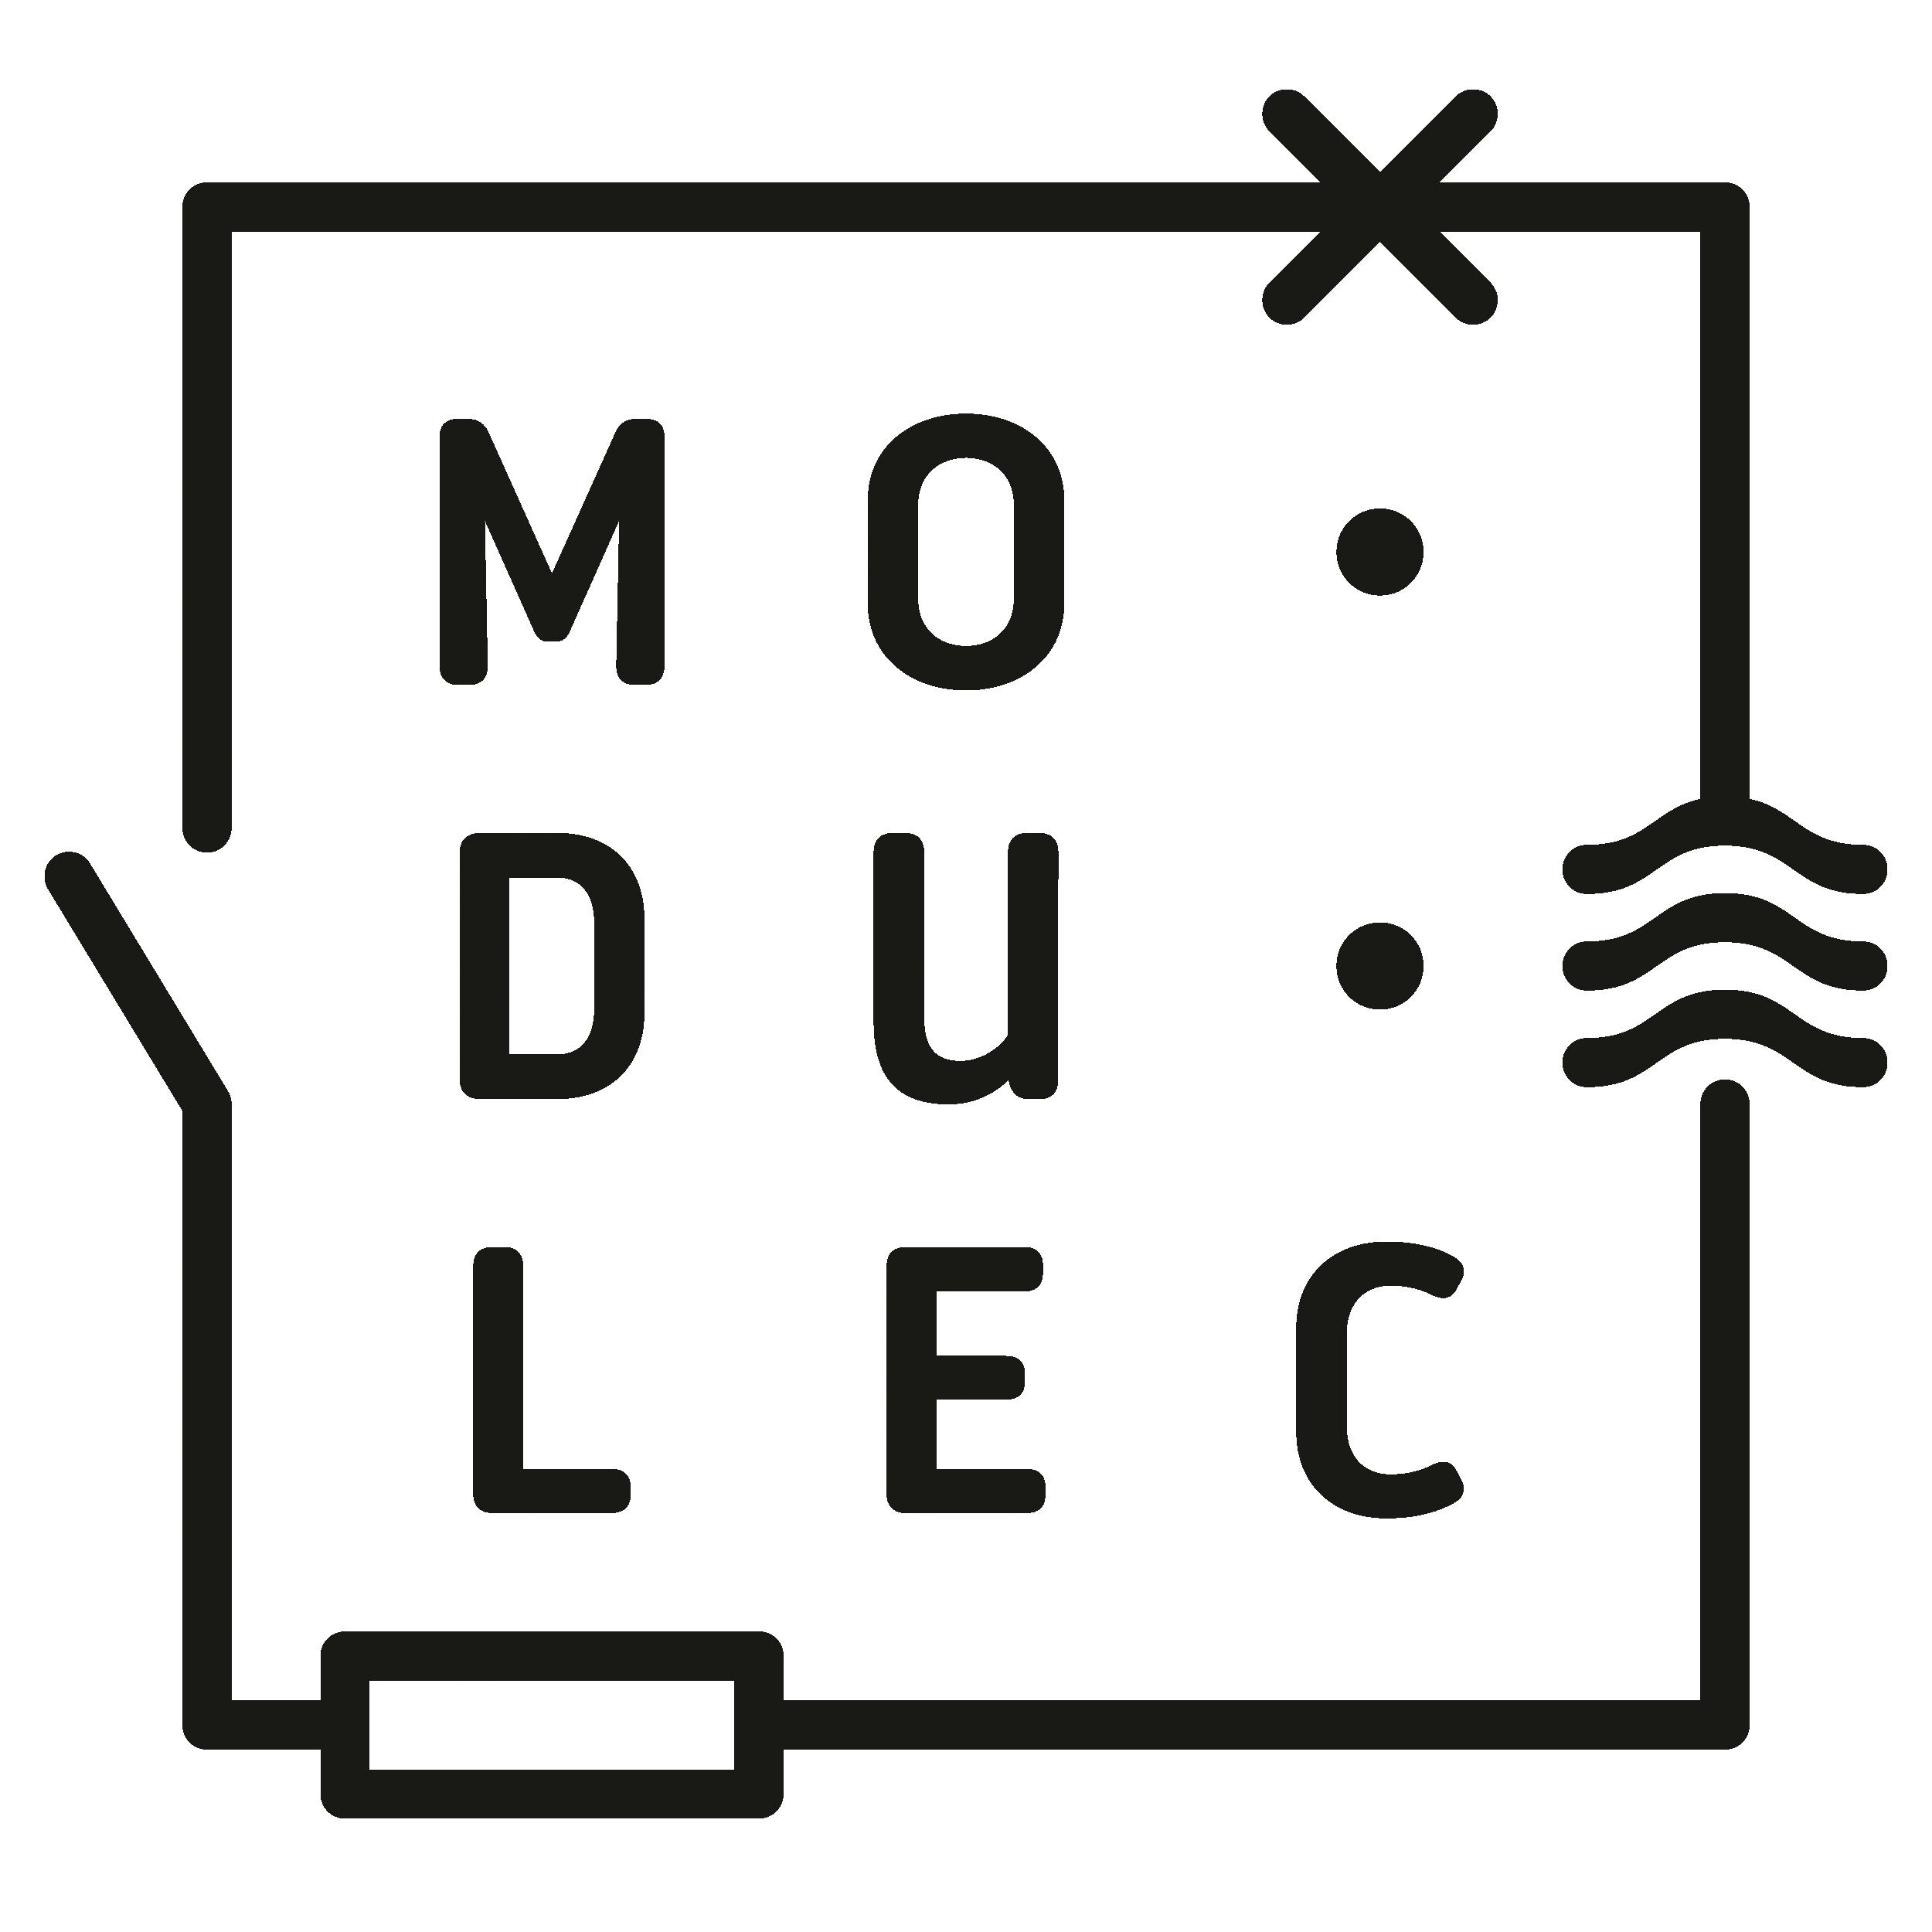 MODULEC_LOGO_CMYK_black (1)